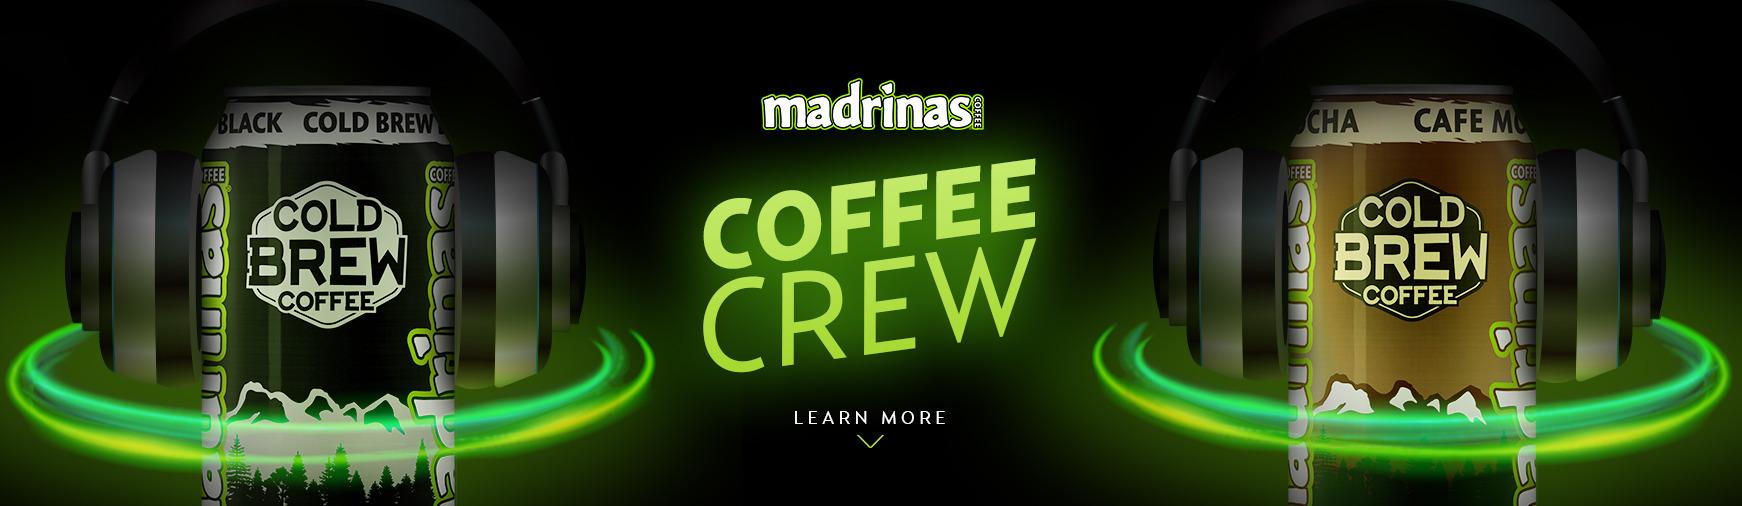 Madrinas - Coffee Crew Streamer Application